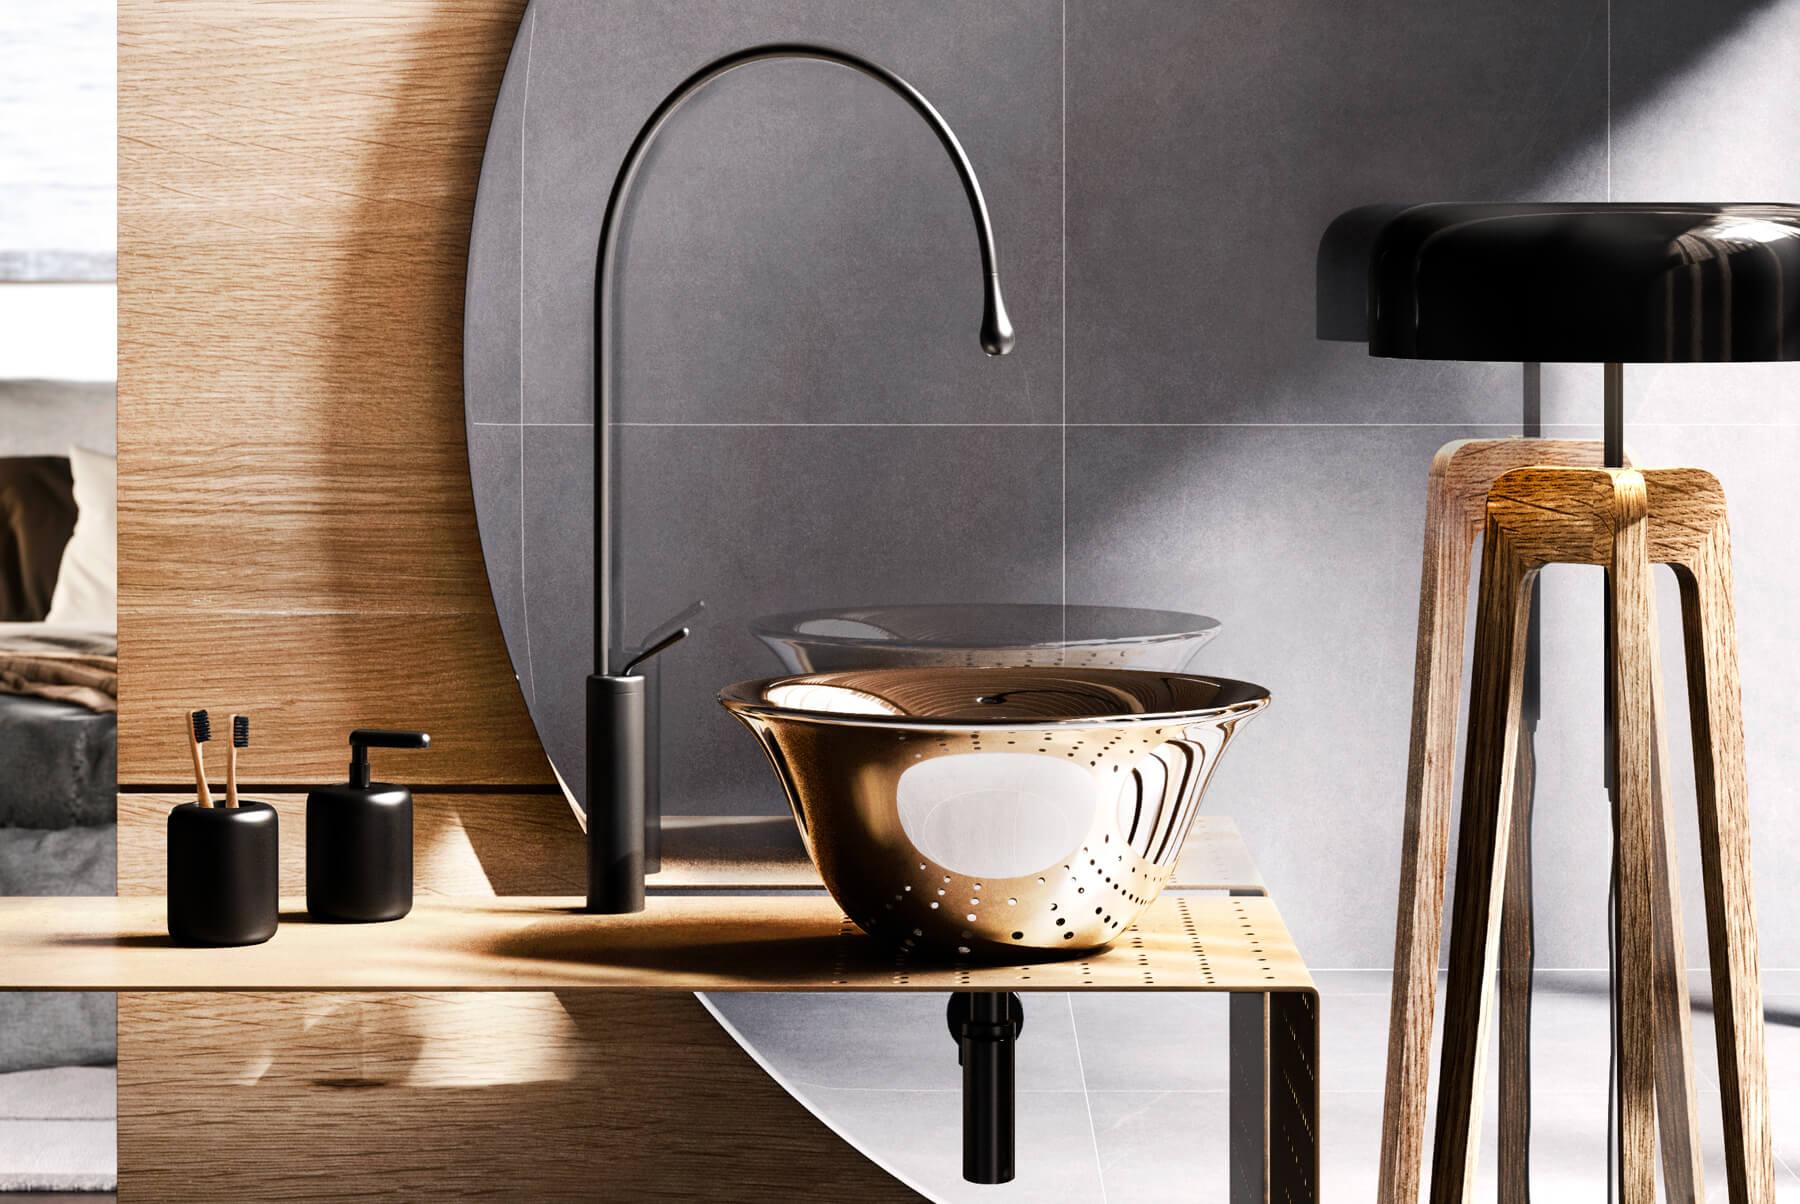 Brassware-GESSI-Goccia-insert-7-1800x1204